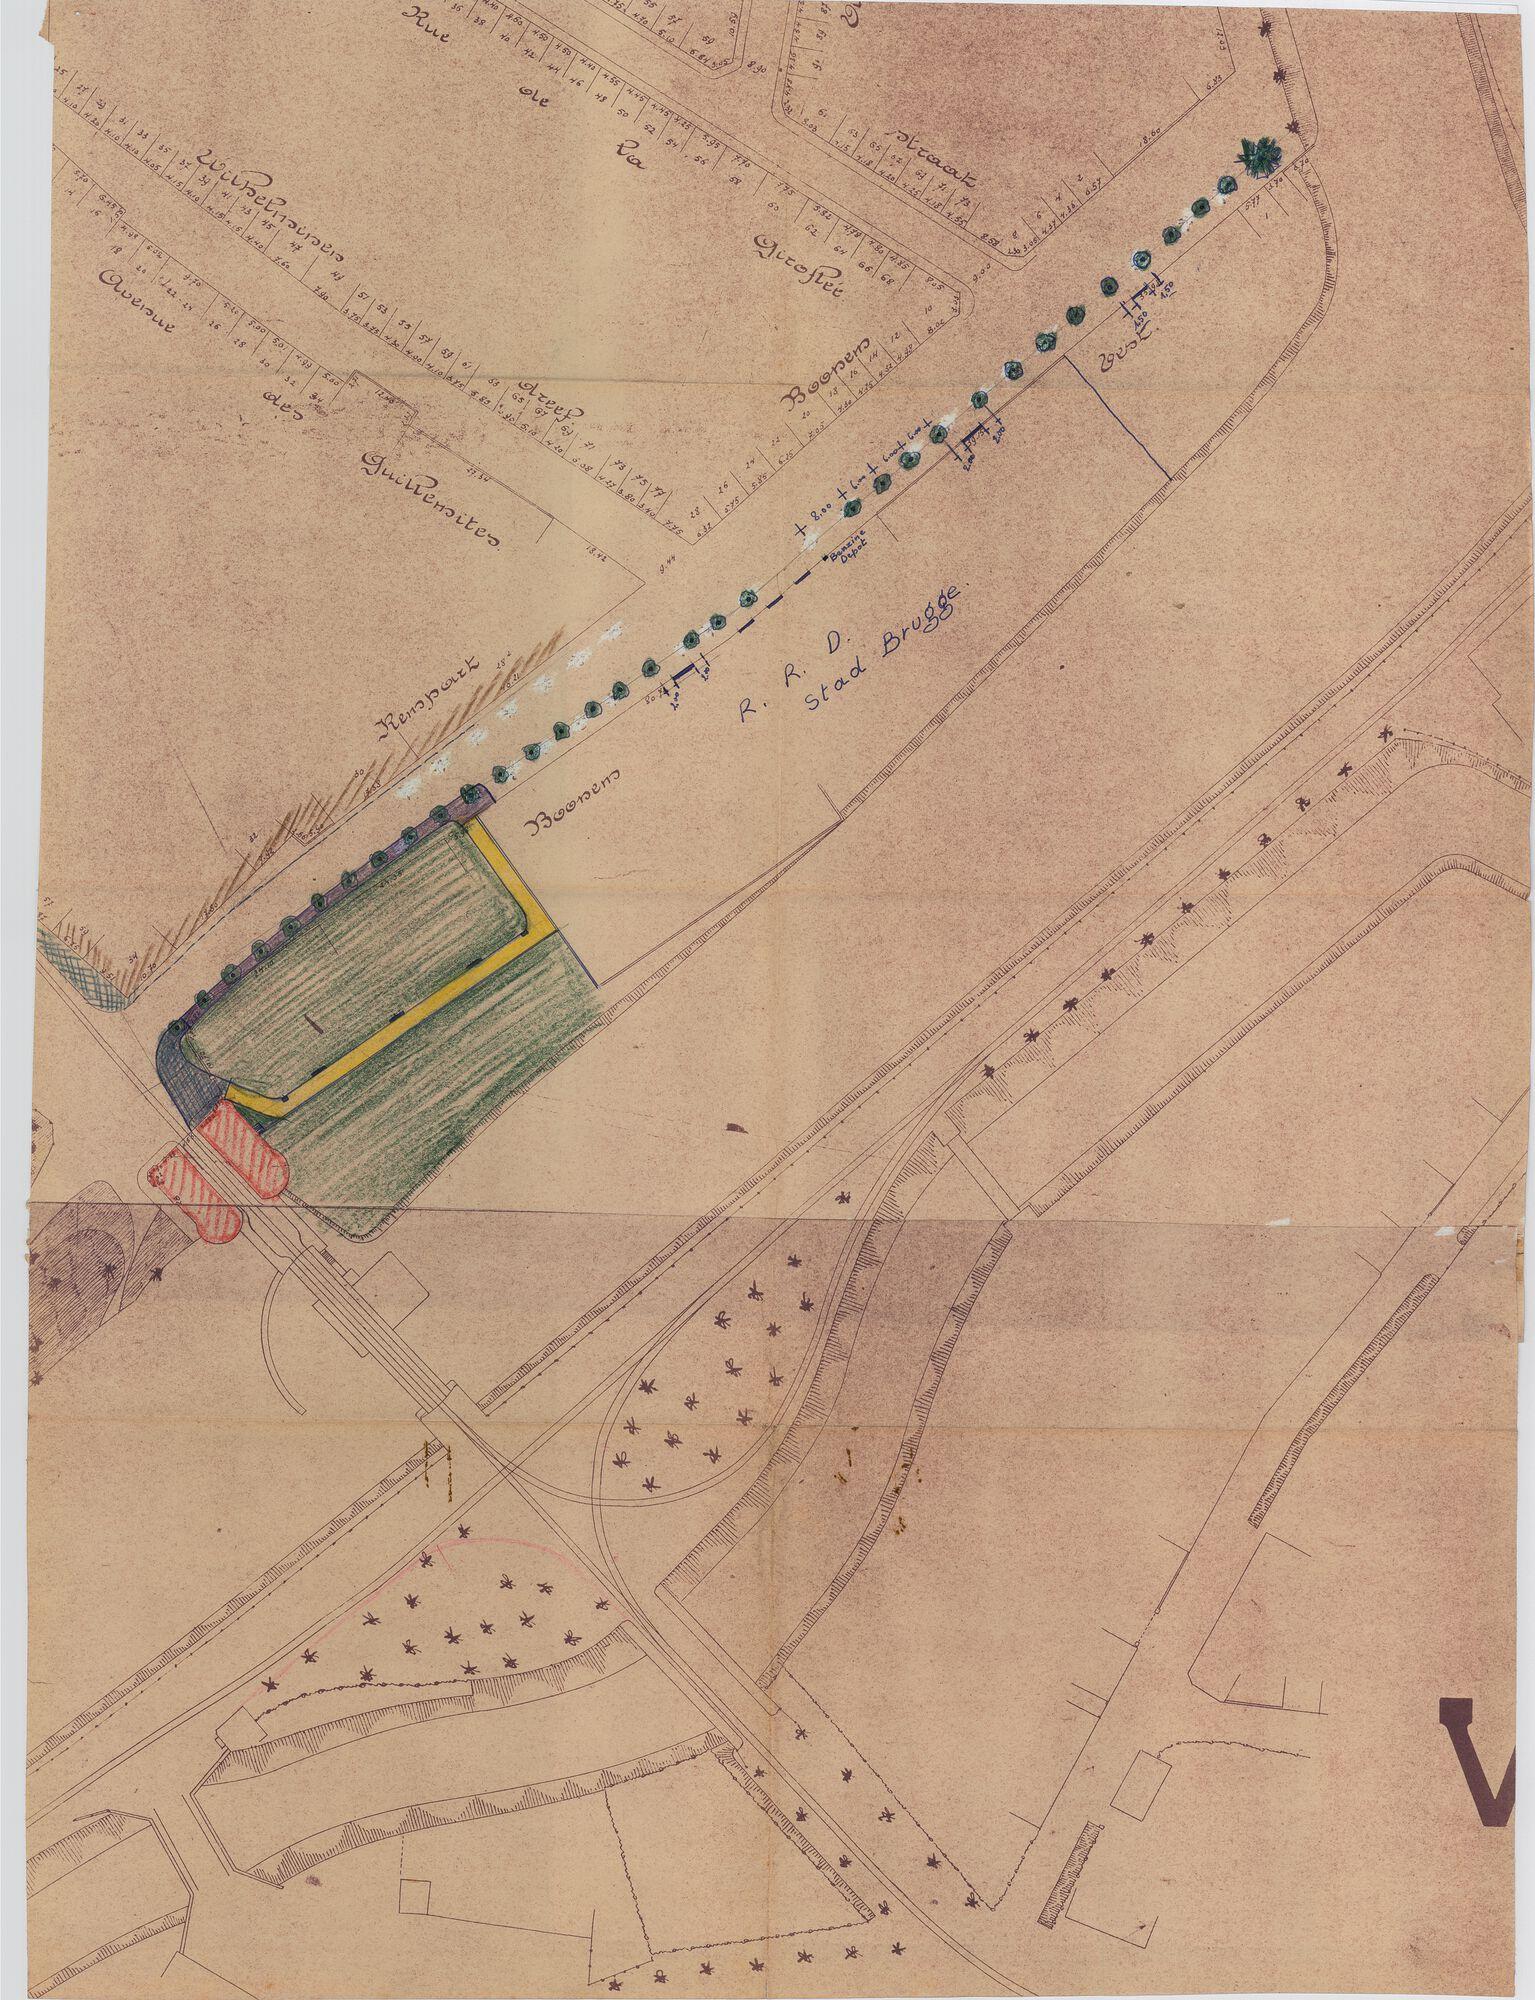 1952 Boninvest - Beplantingsplan.tif